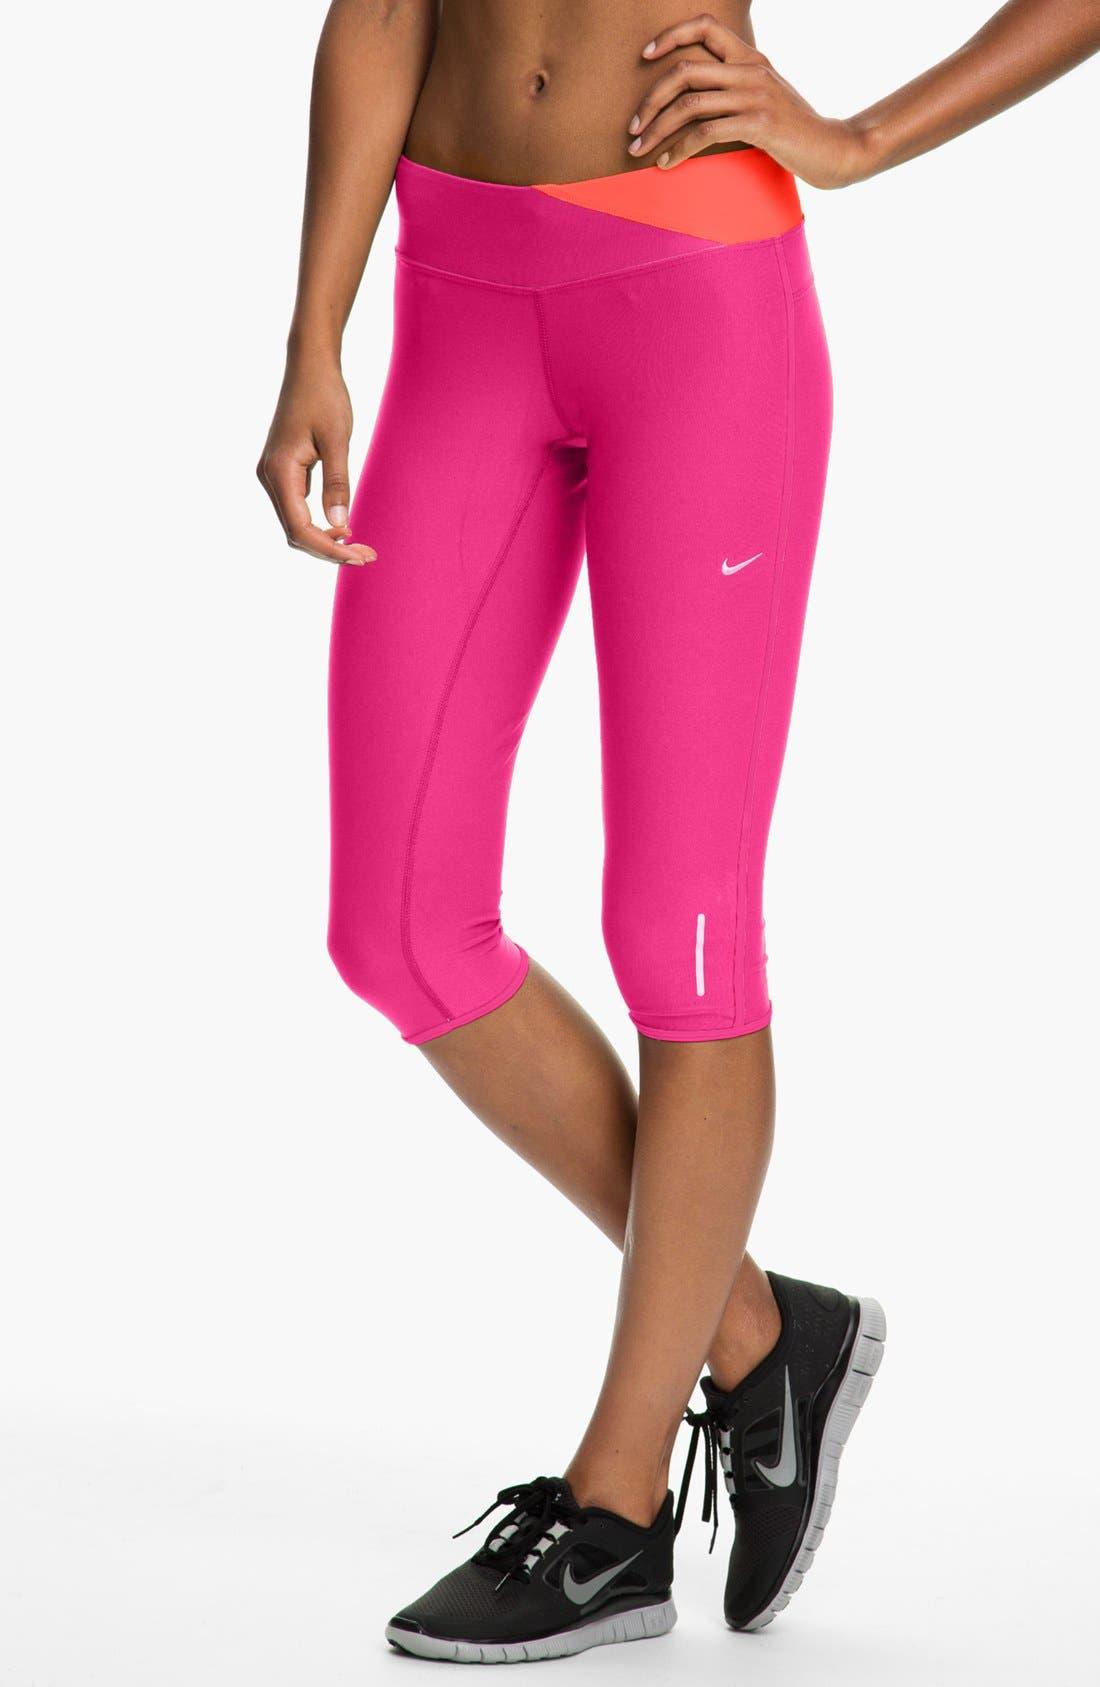 Alternate Image 1 Selected - Nike 'Twisted' Running Capris